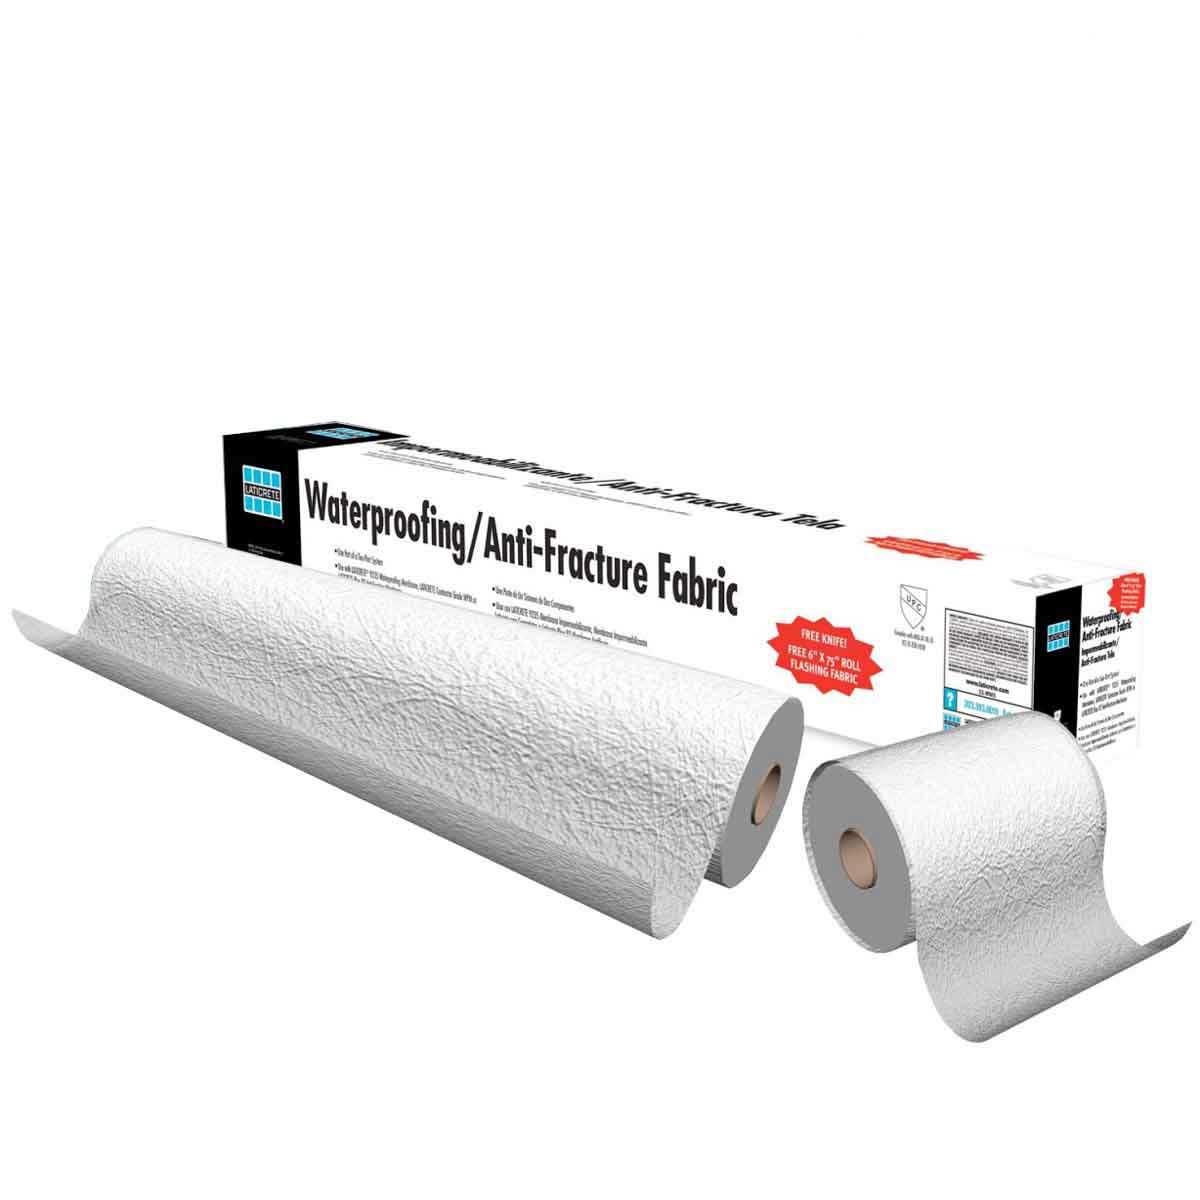 Laticrete Waterproofing Membrane